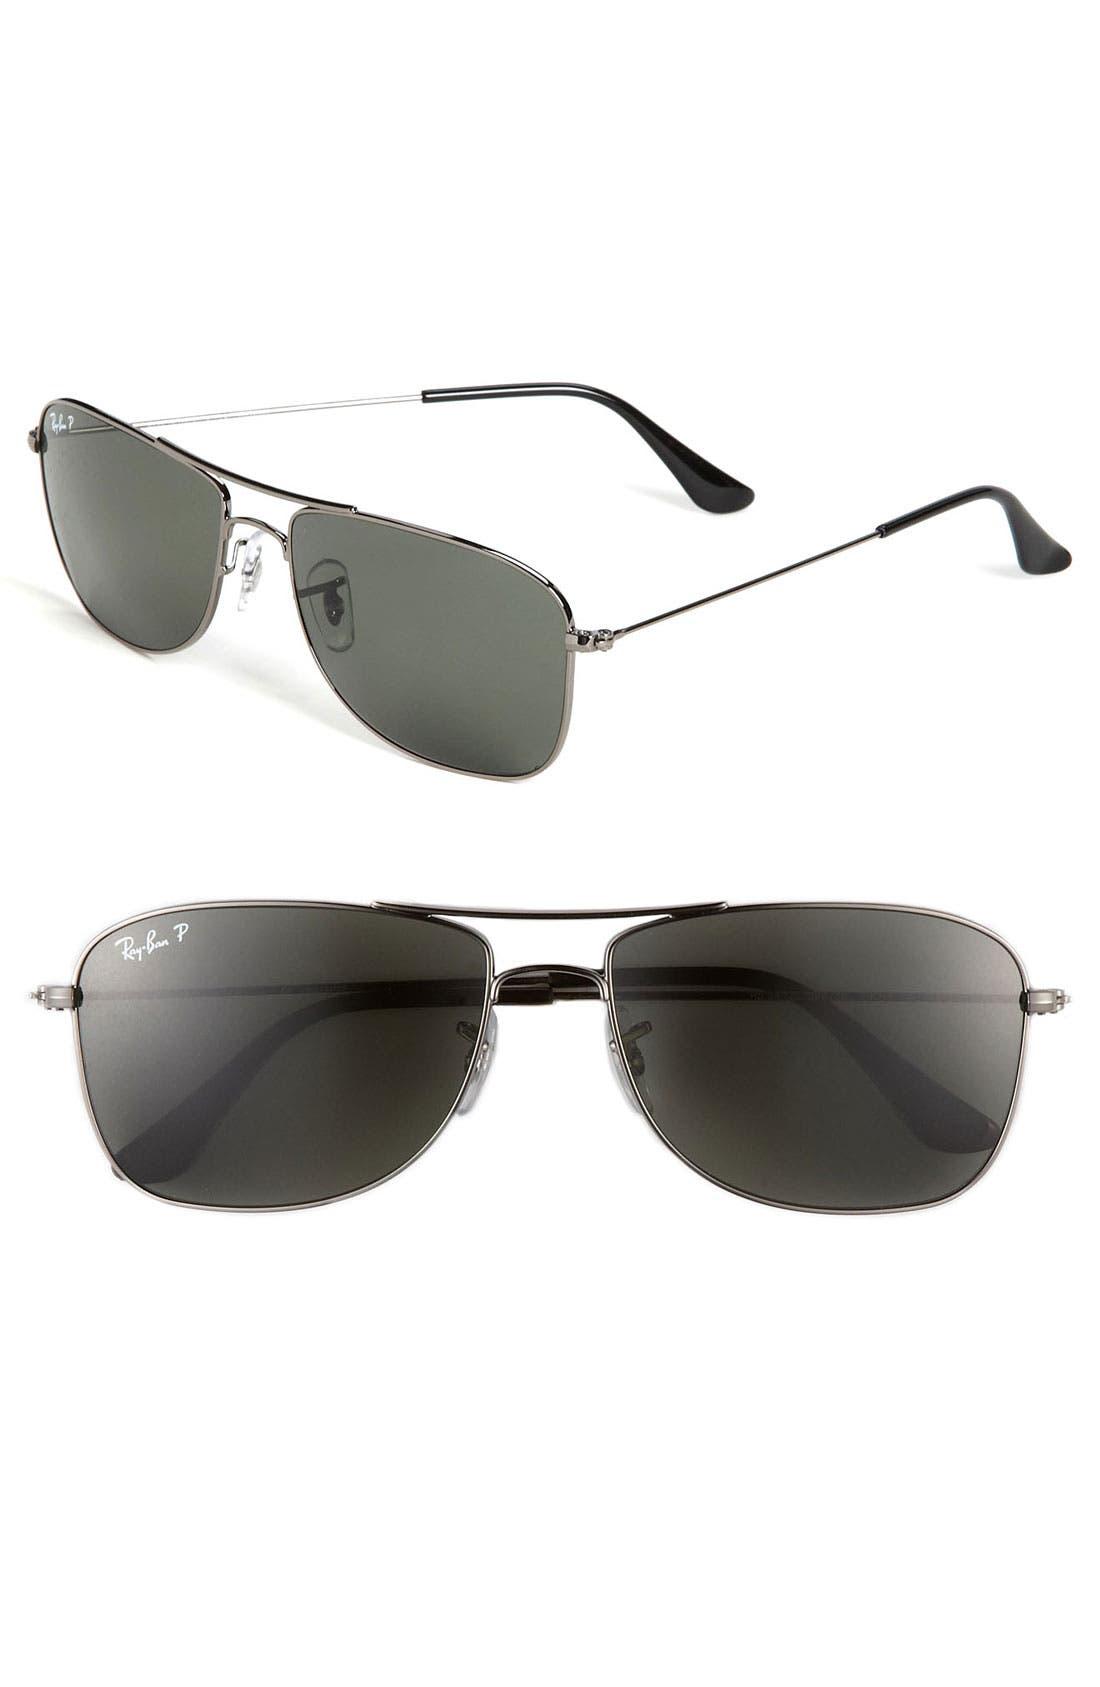 Main Image - Ray-Ban 'M Mod Caravan' 59mm Polarized Aviator Sunglasses